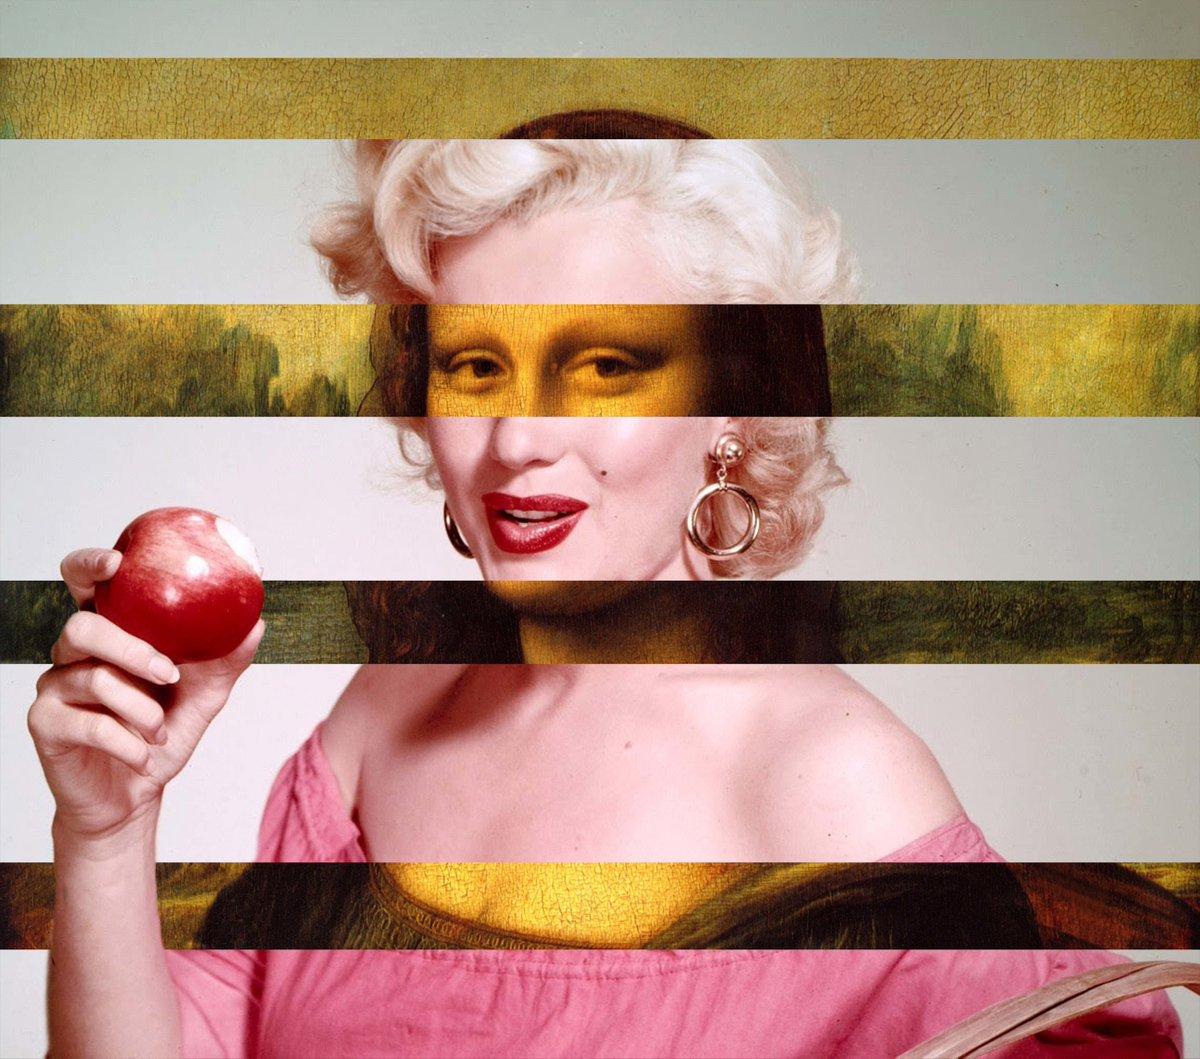 bra Hacked Marilyn Monroe naked photo 2017